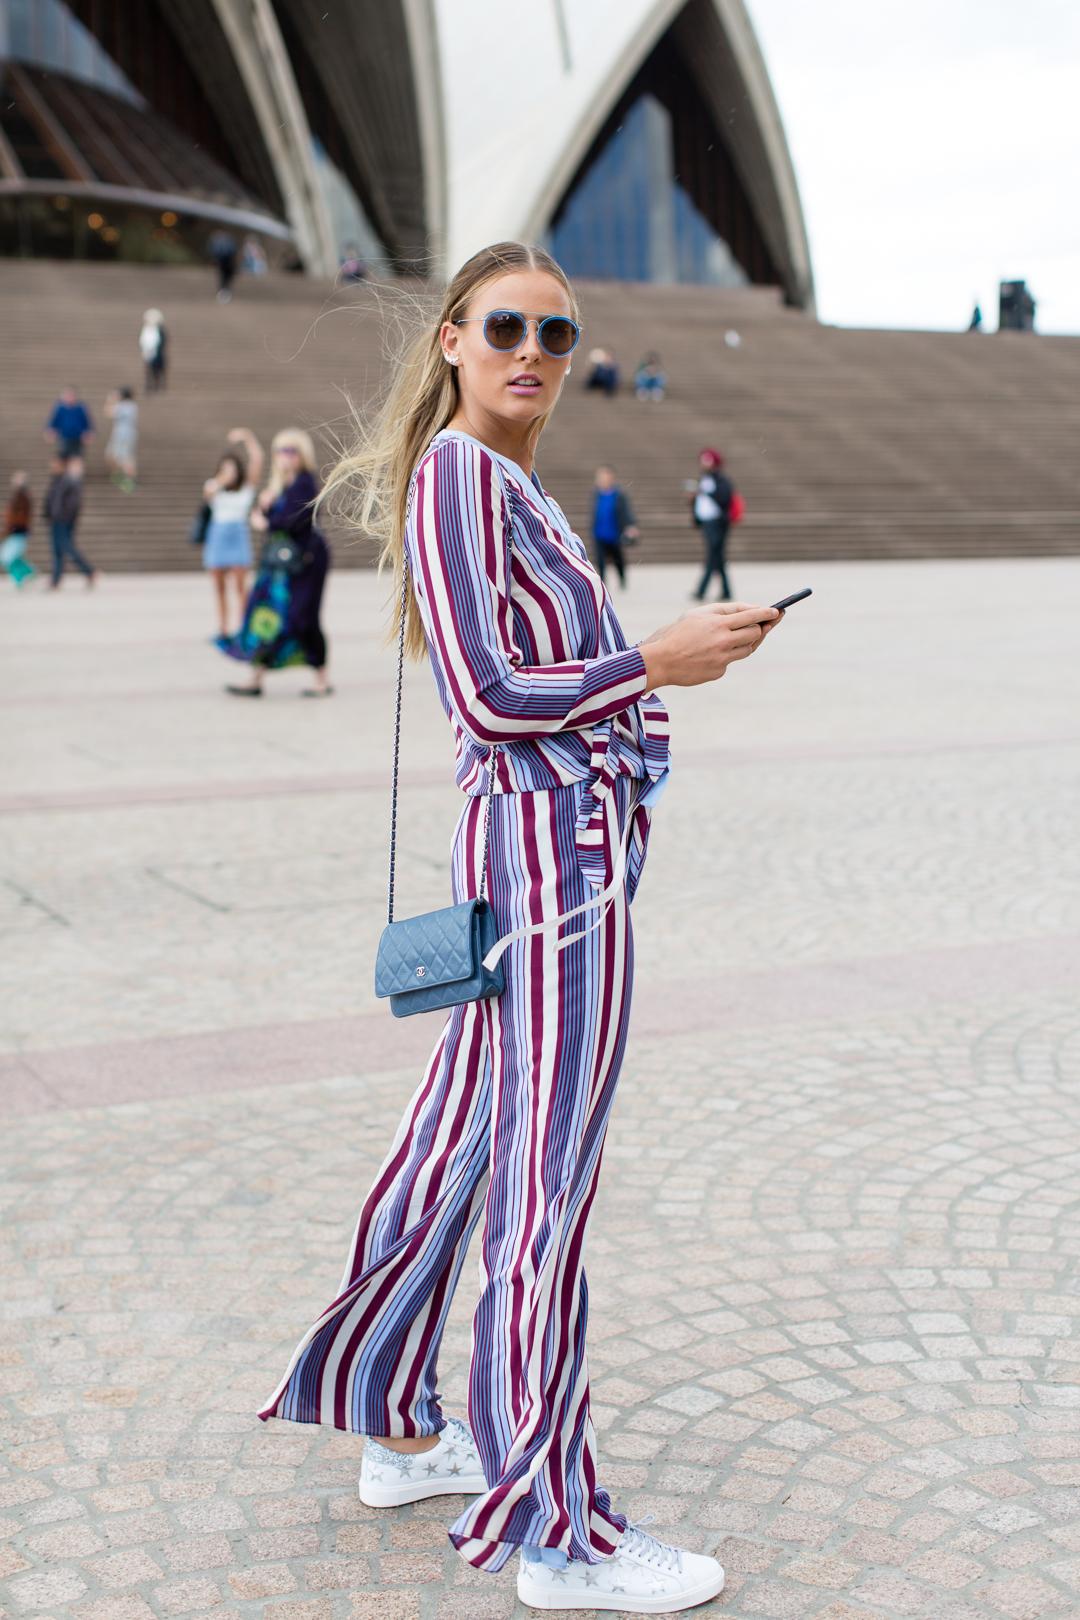 Paige-Newton-Sydney-Fashion-Week-Sydney-Chic-Blogger-Mananement0004.jpg